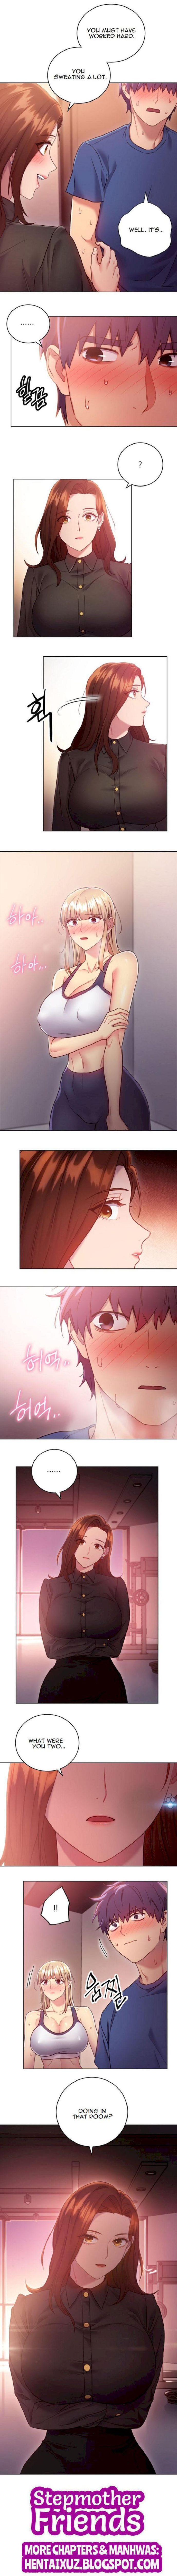 [Neck Pilllow] Stepmother Friends Ch.39/? [English] [Hentai Universe] NEW! 13/10/2020 176